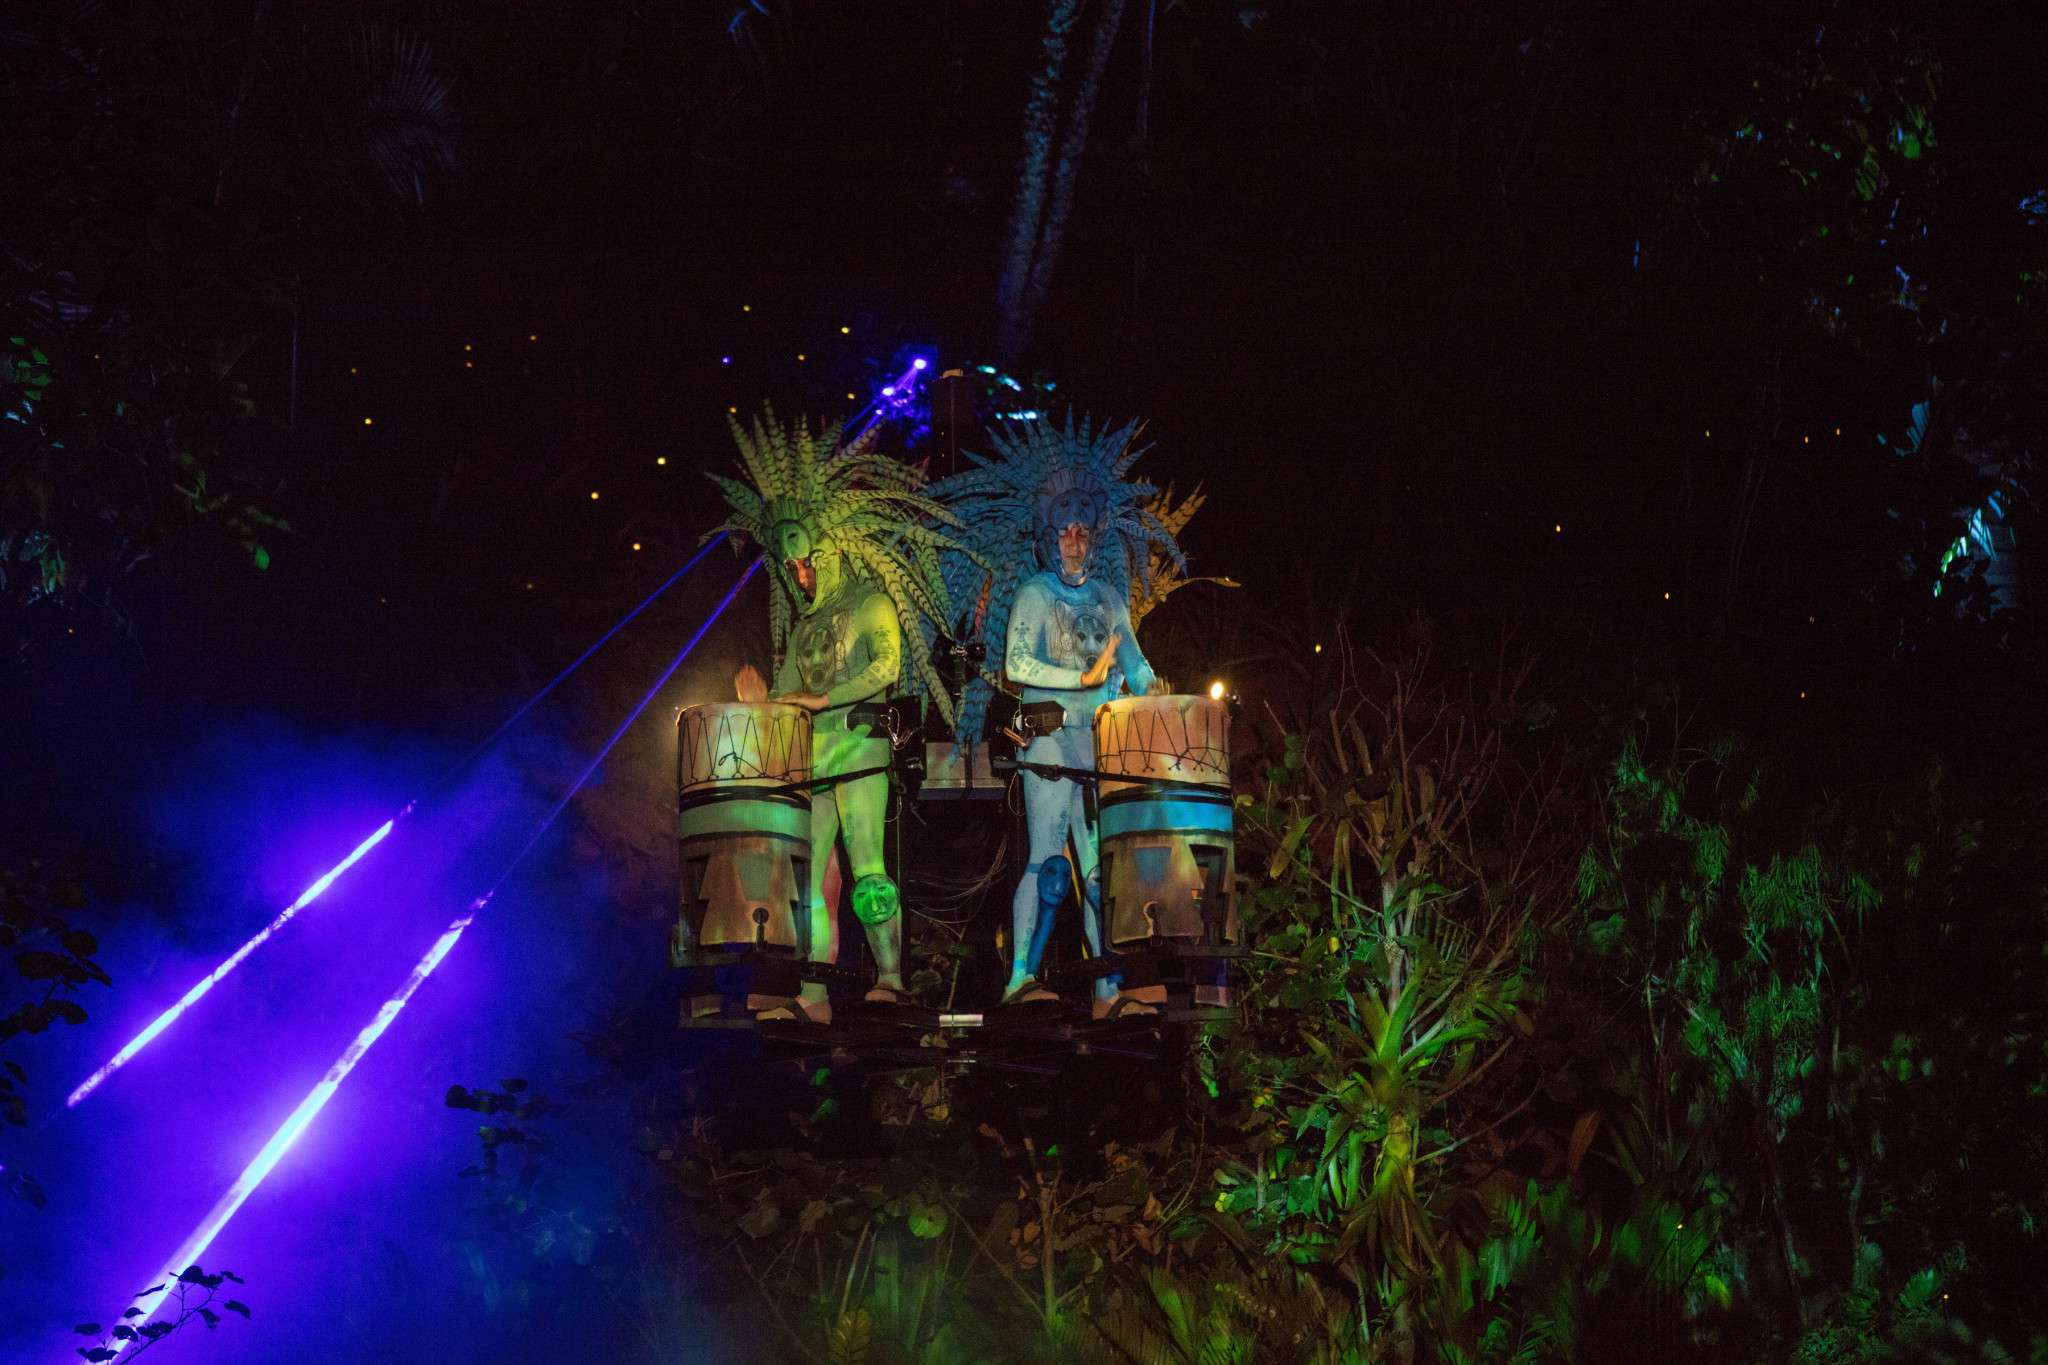 Rhythms Of The Night Open Bar - Last Minute Tours in Puerto Vallarta